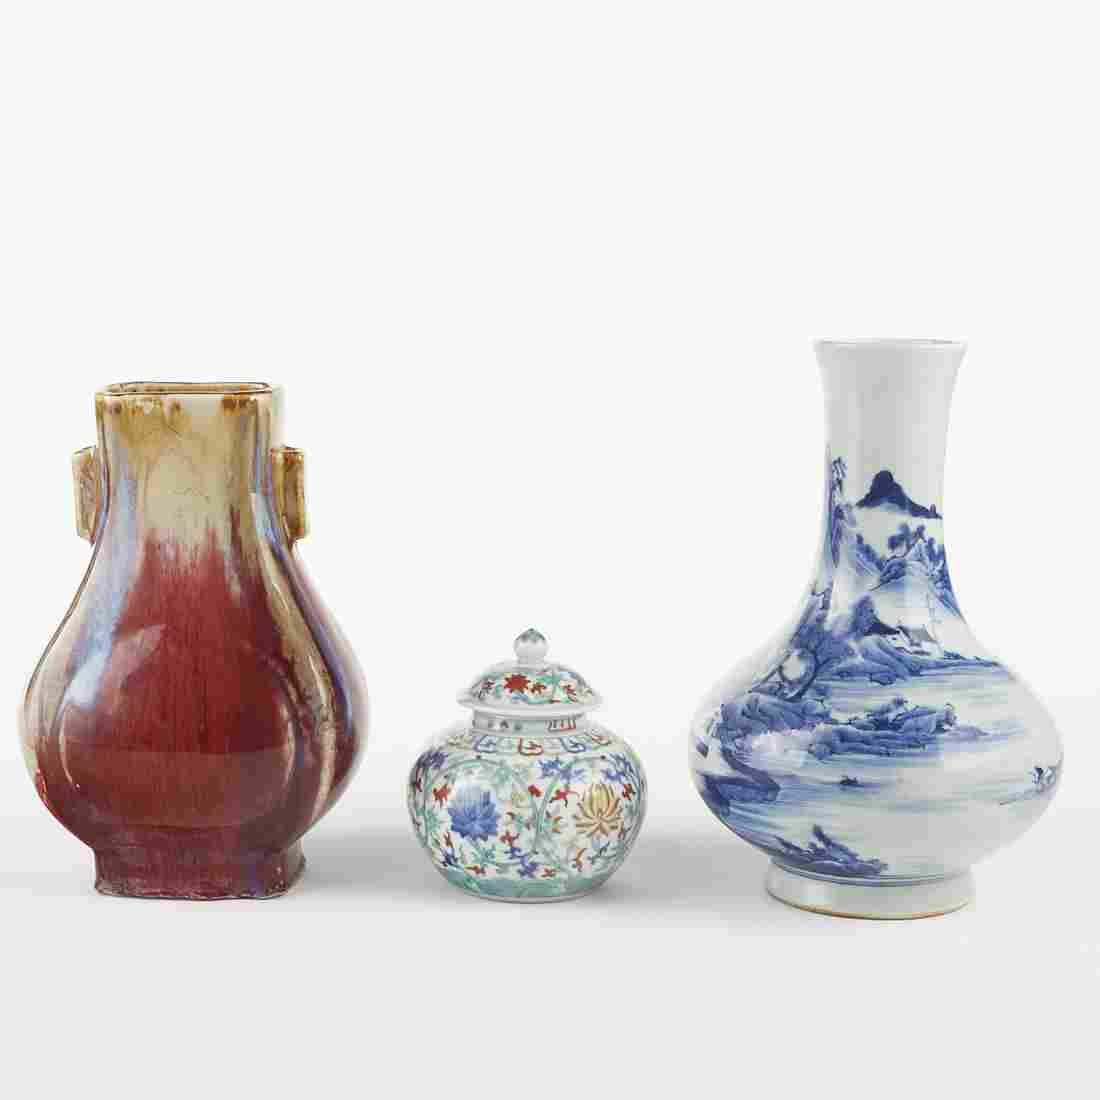 Grp: 3 20th c. Chinese Republic Porcelain